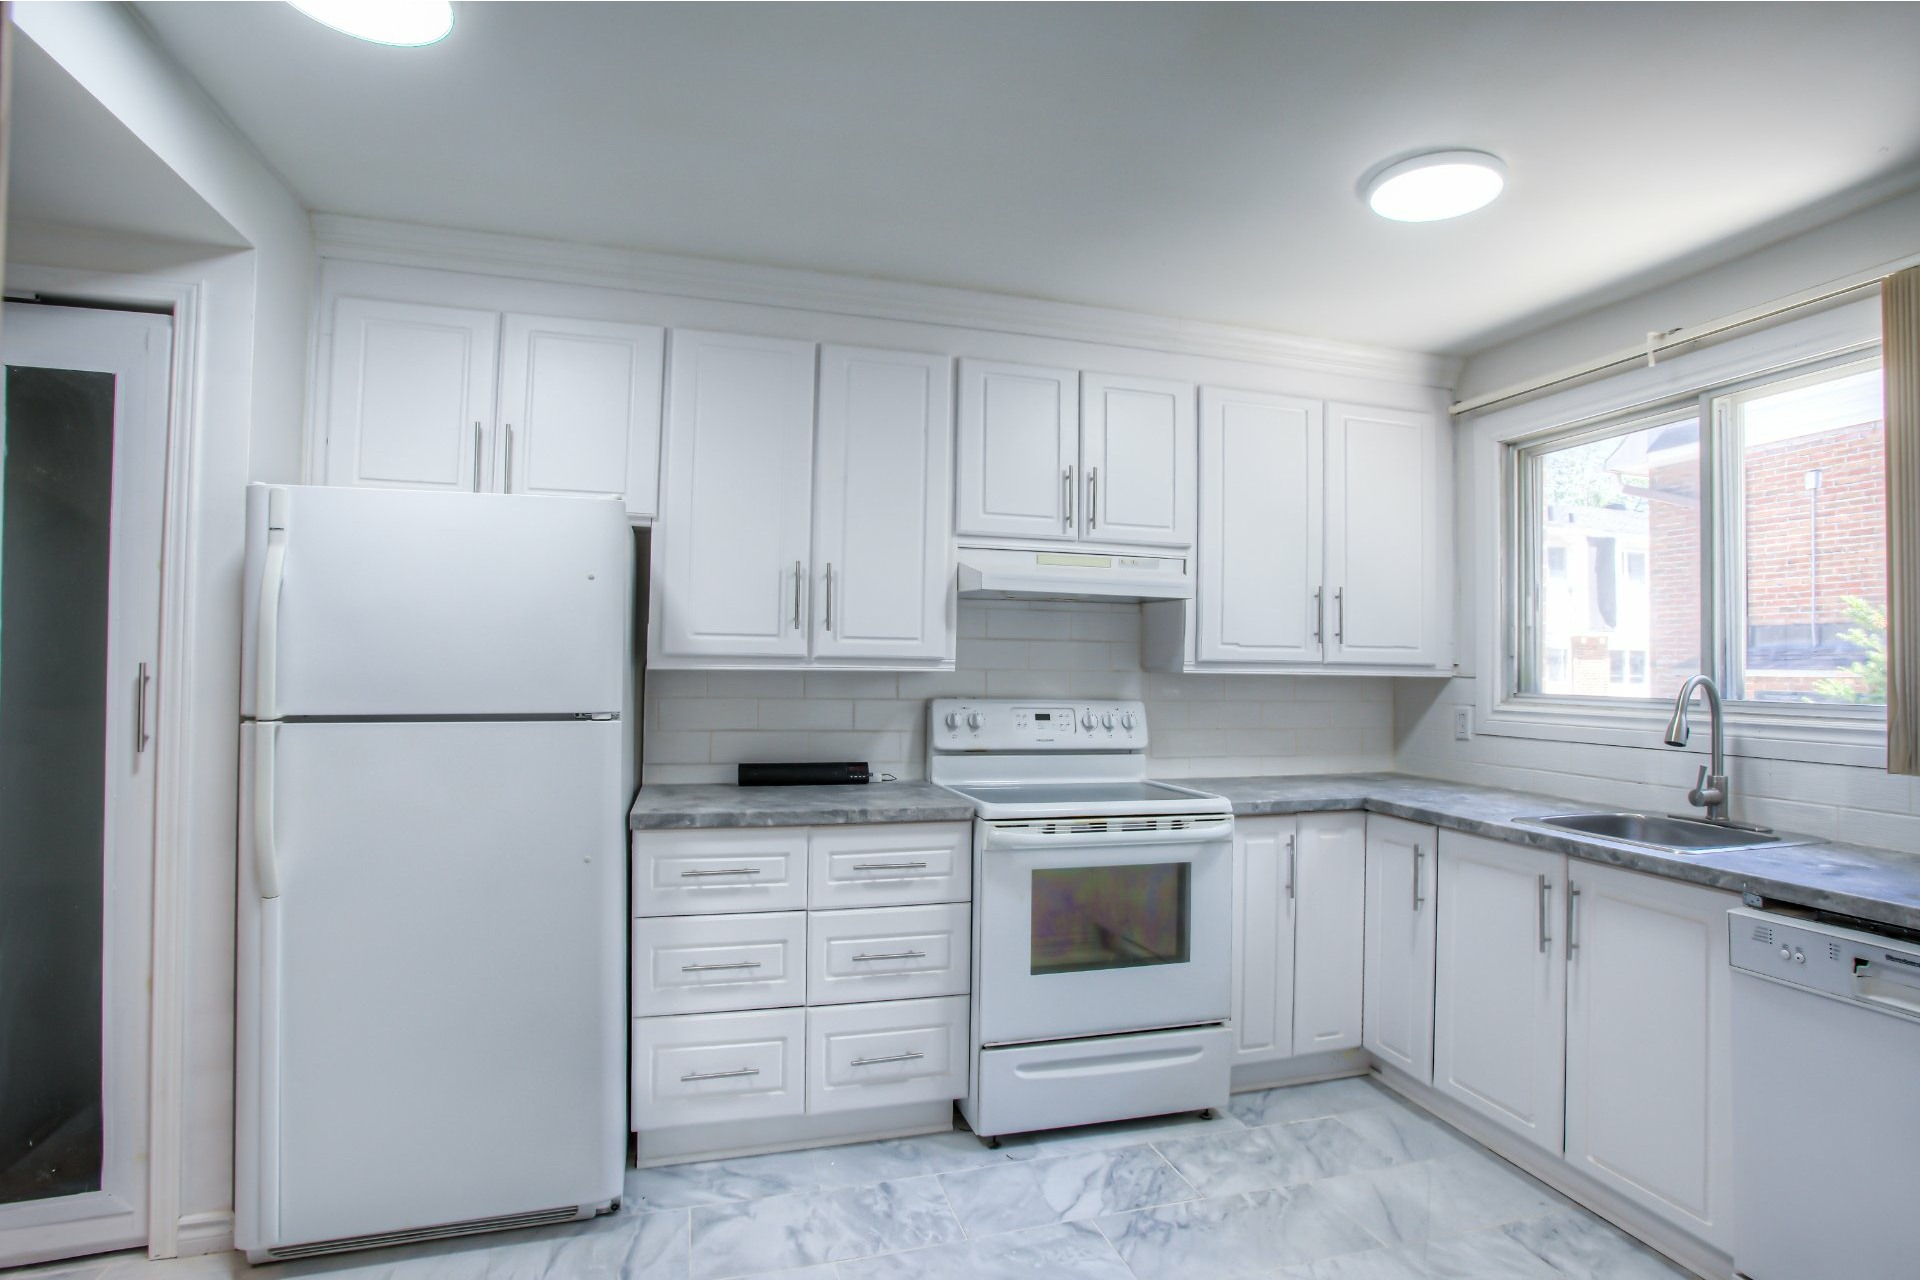 image 6 - MX - Casa sola - MX En venta Dollard-Des Ormeaux - 7 habitaciones